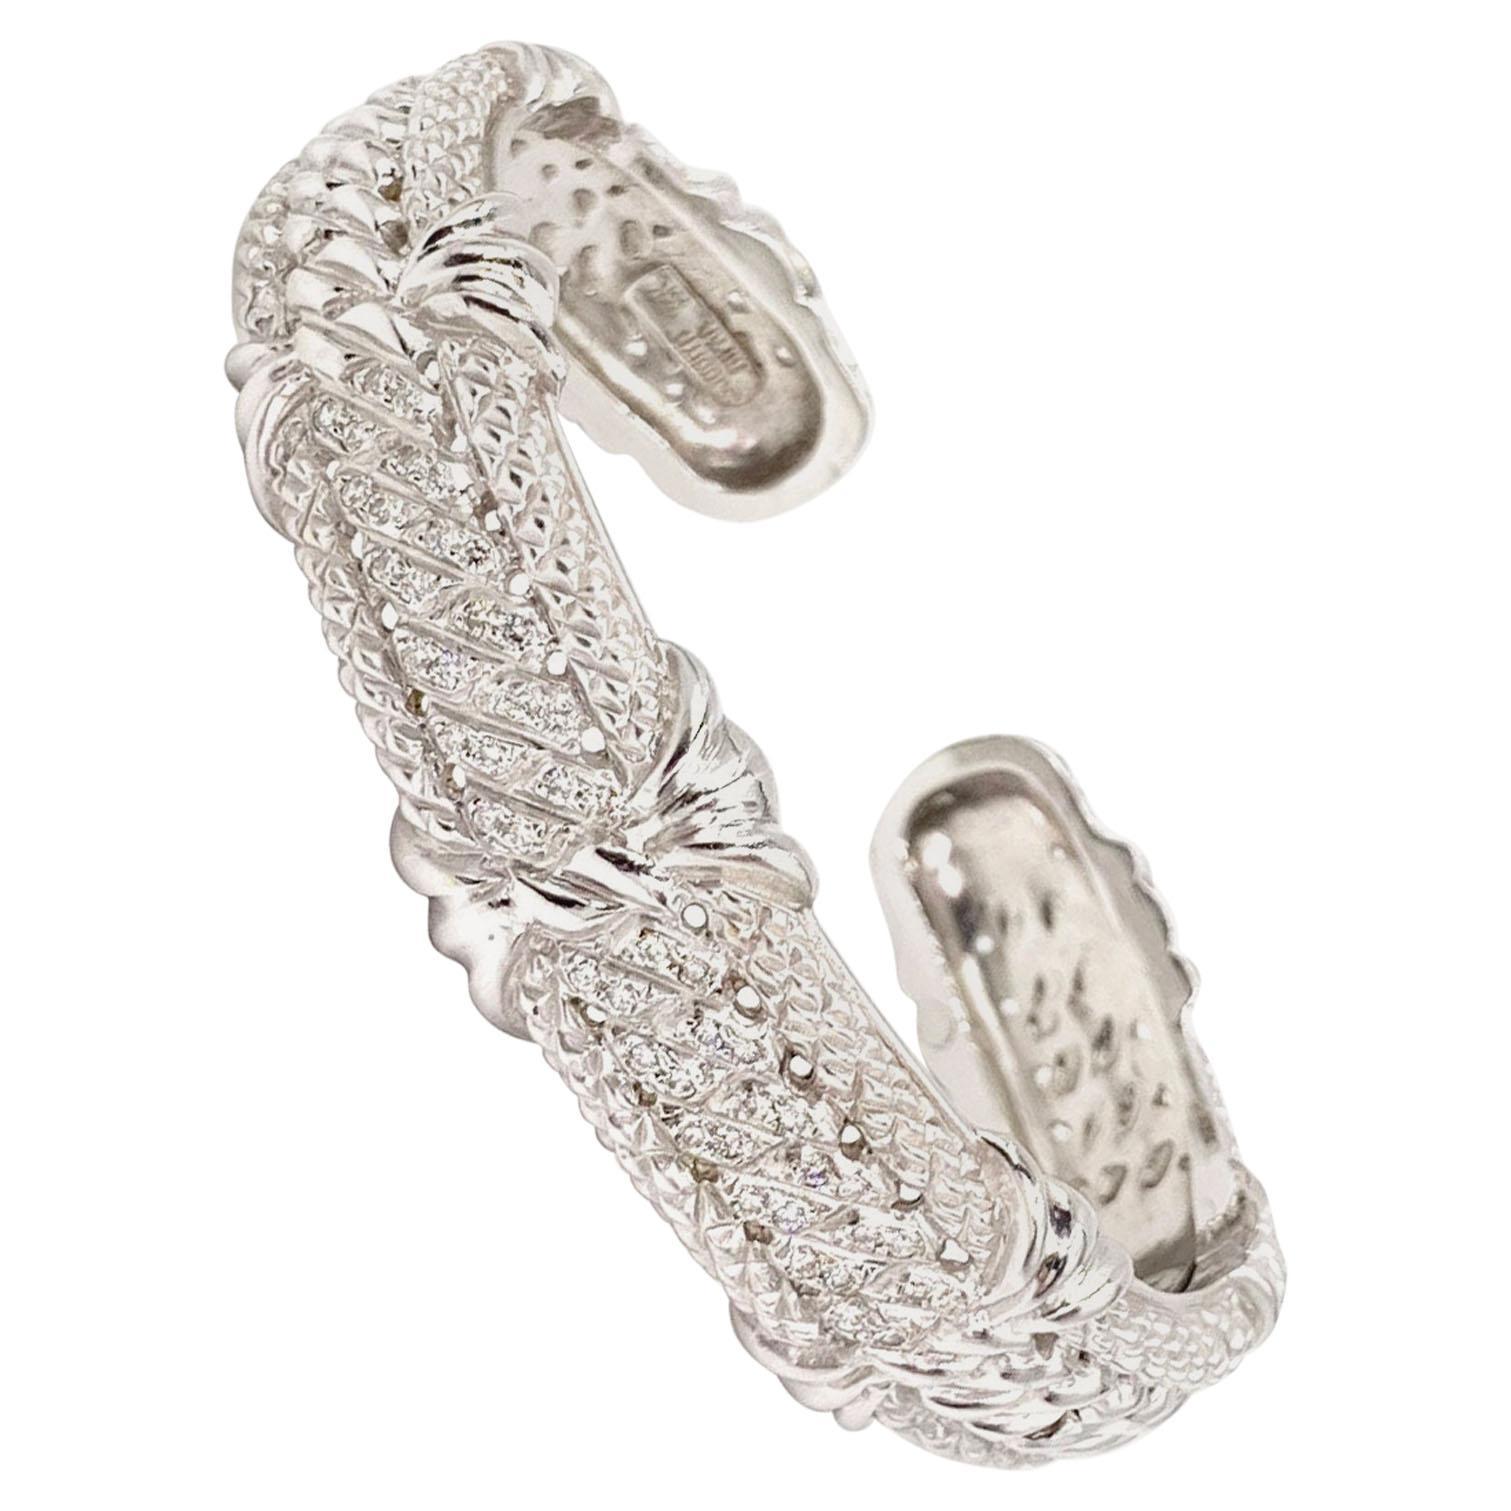 Judith Ripka 18 Karat White Gold and Diamond Carved Cuff Bracelet